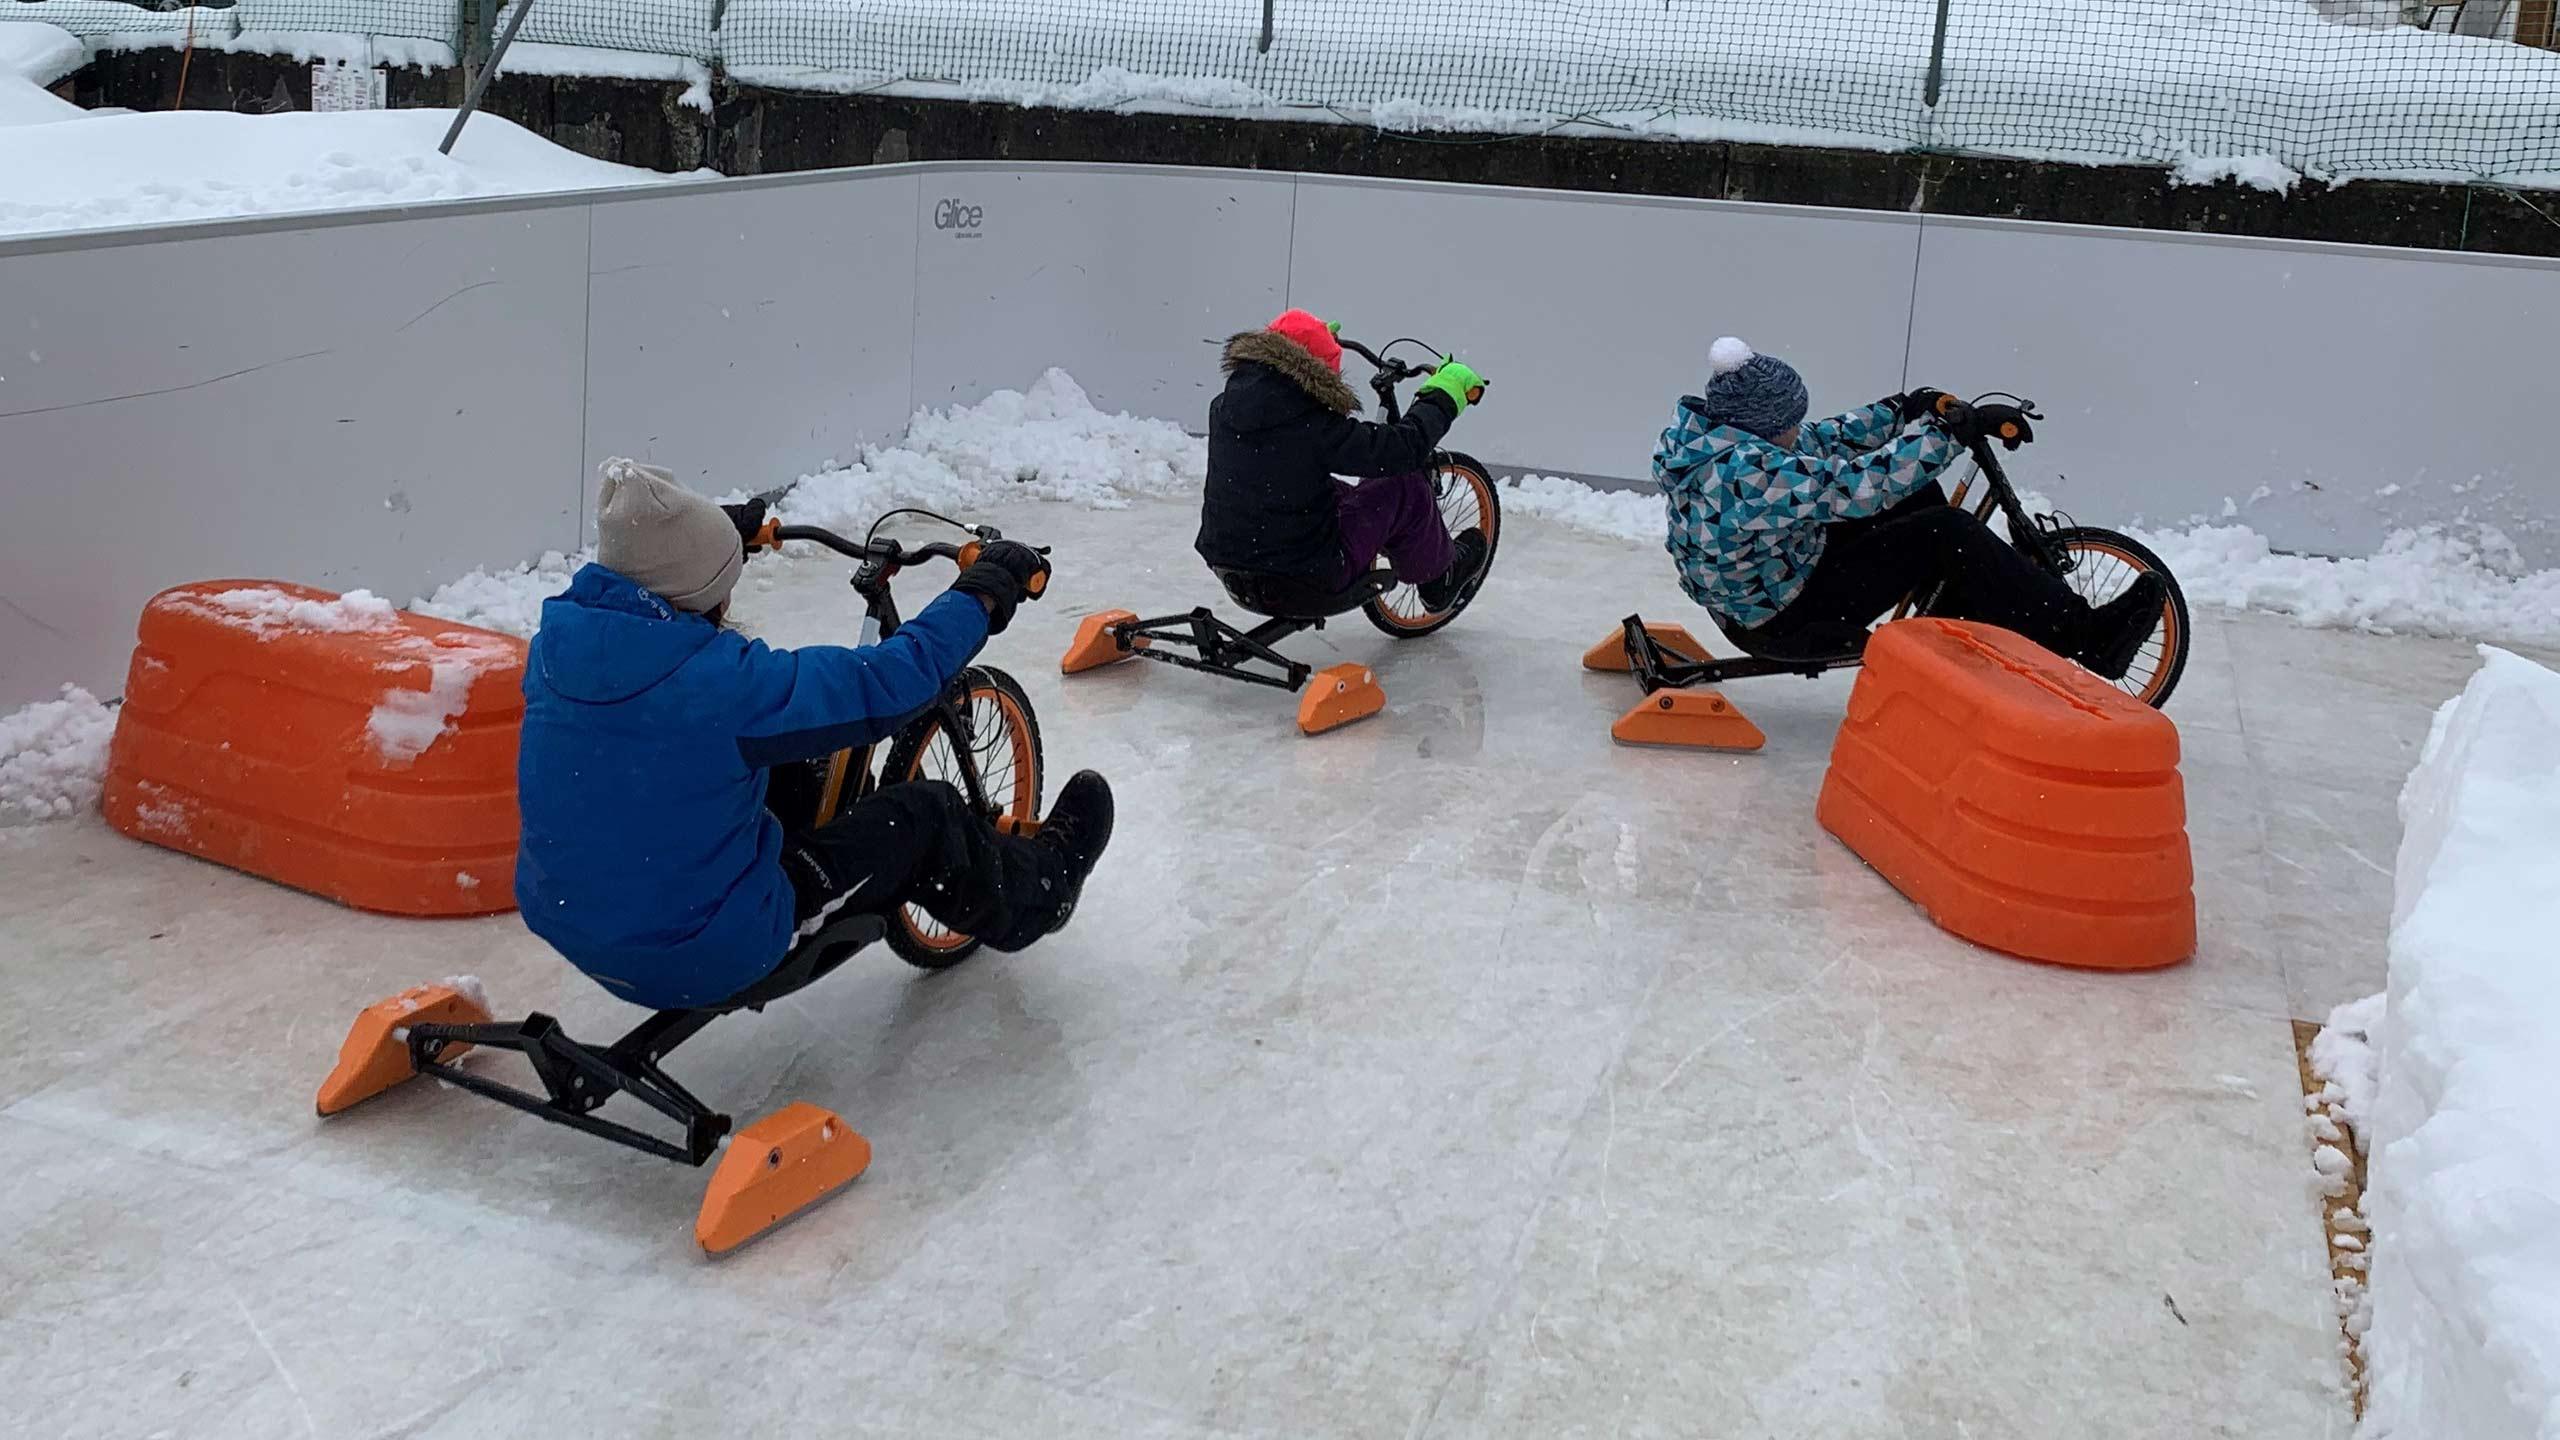 ice-bike-fahrt-rundkurs-synthetische-eisbahn-glice-beatenberg.jpg